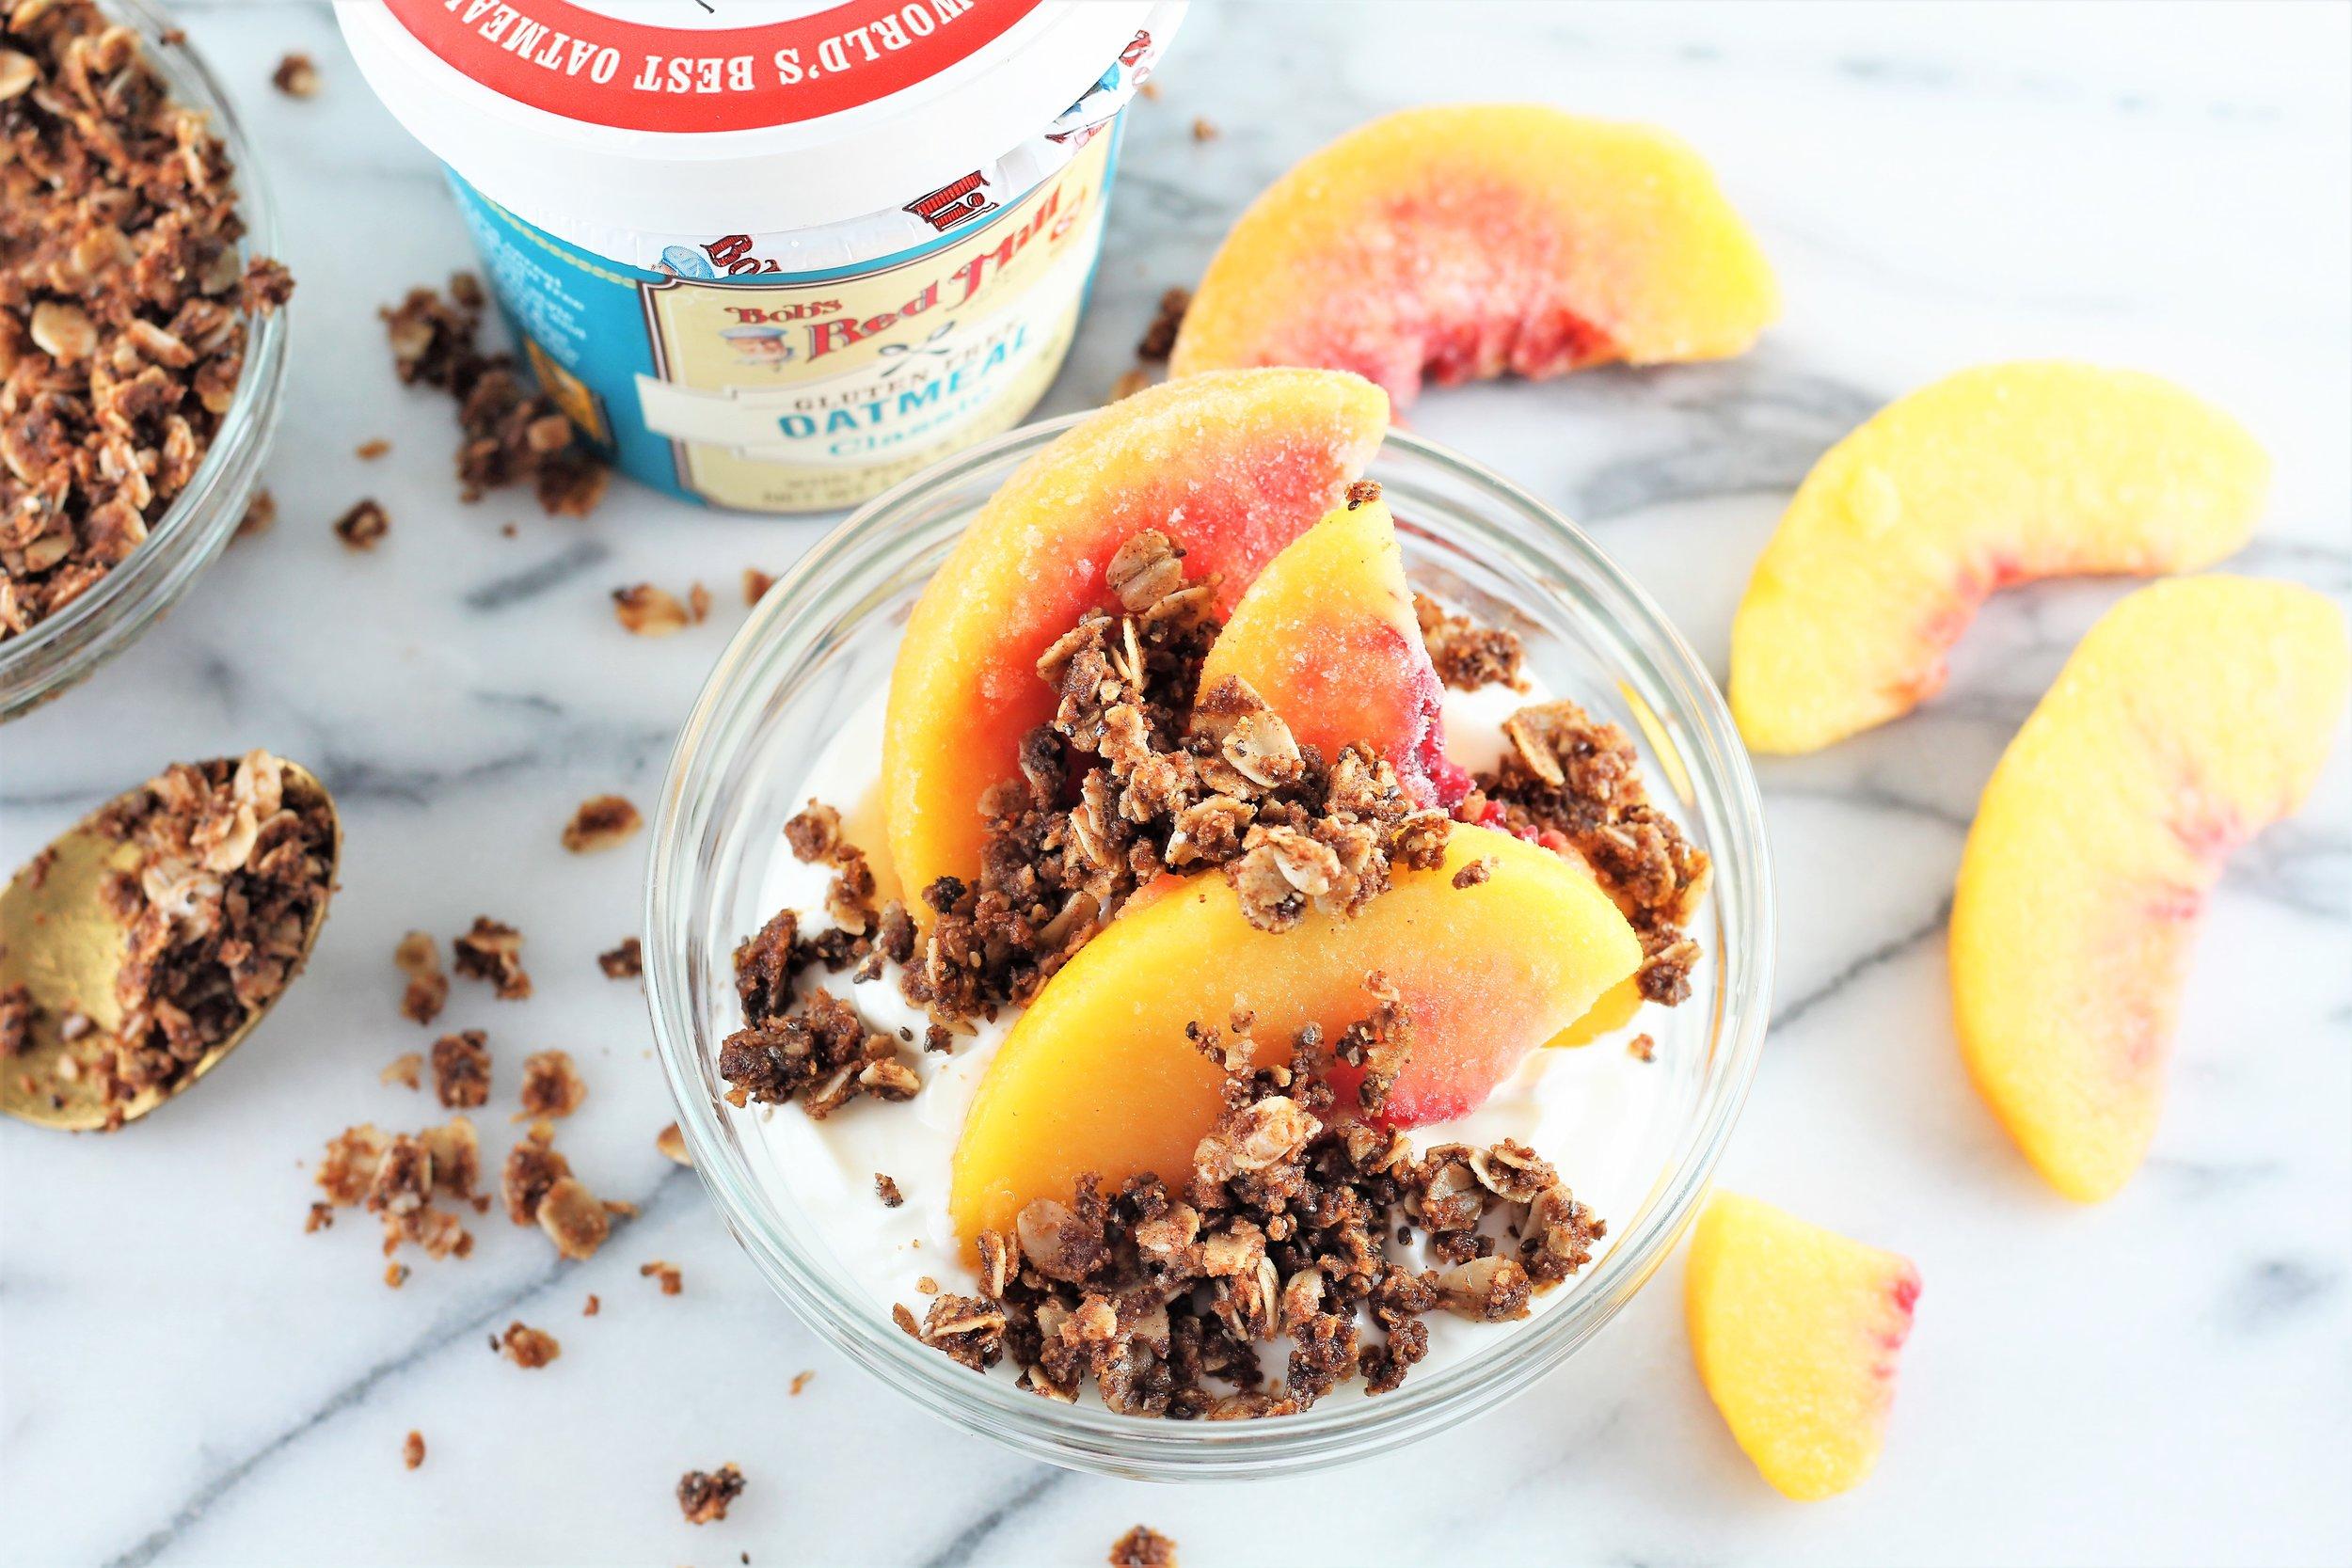 Peaches & Cream with Coconut Chia Oat Crumble